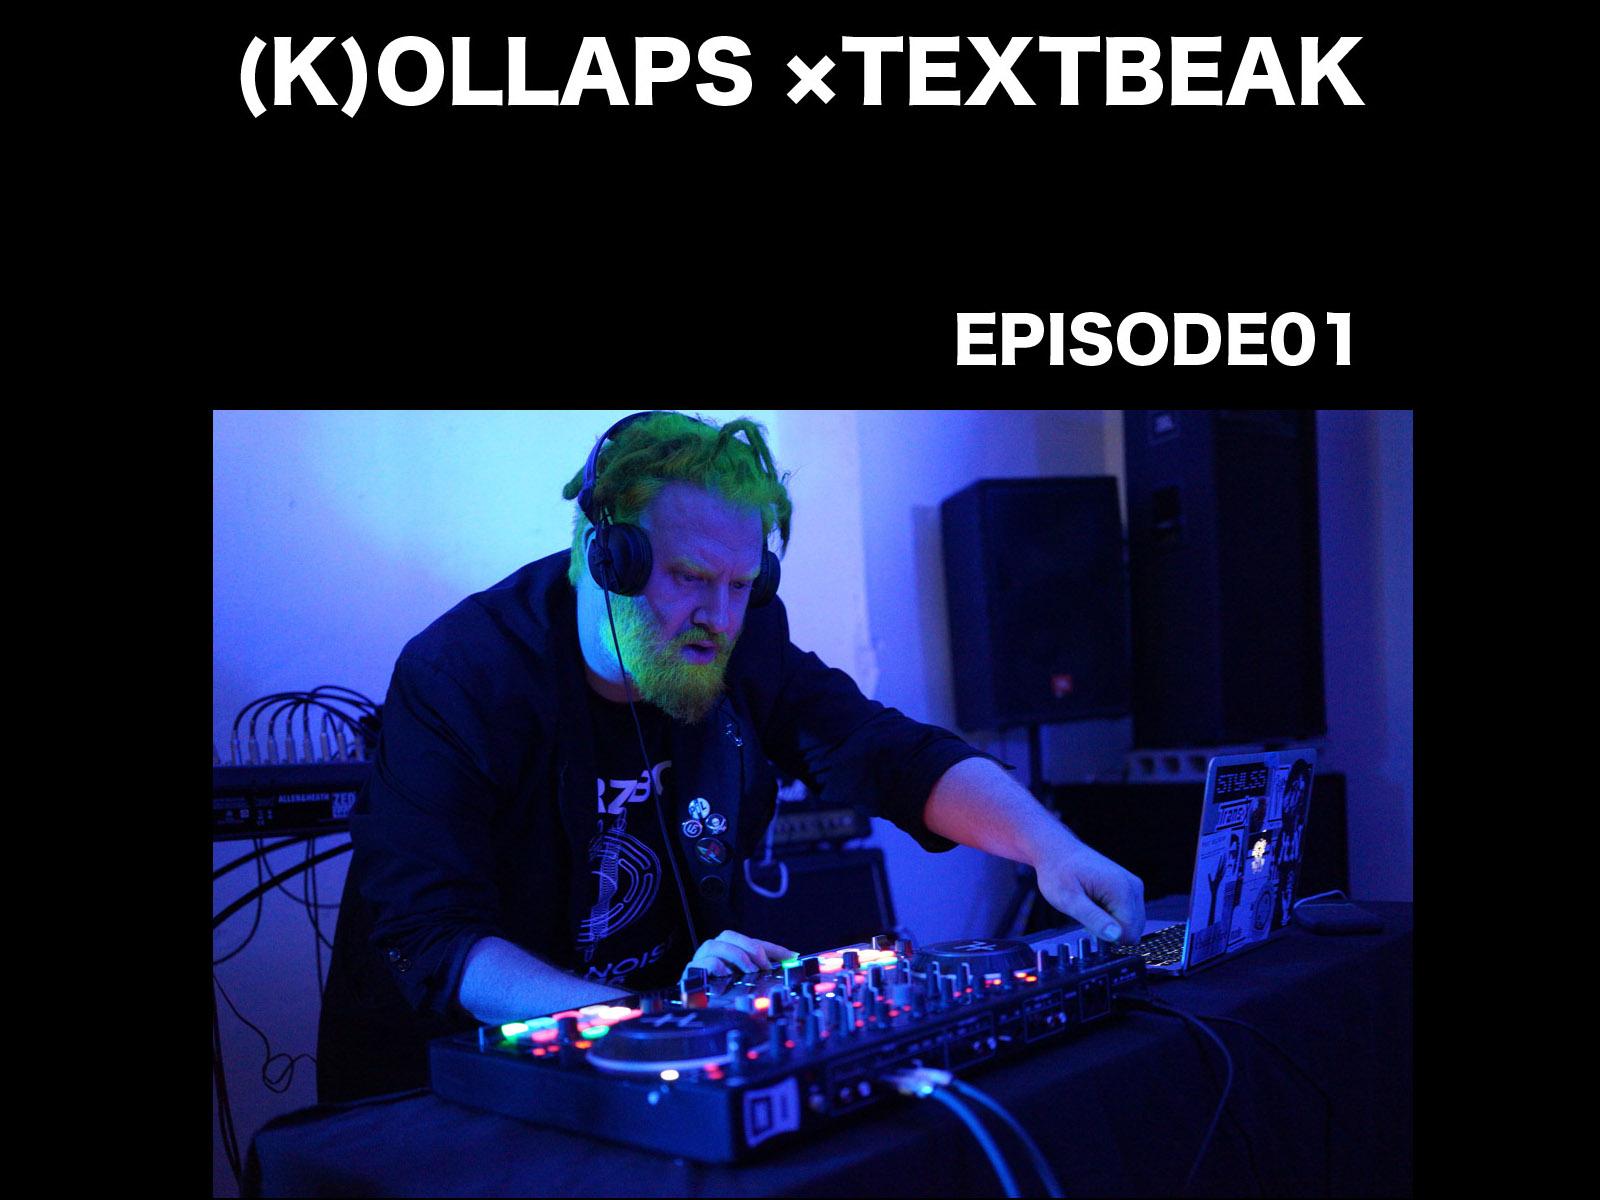 (K)OLLAPS×TEXTBEAK EPISODE 01